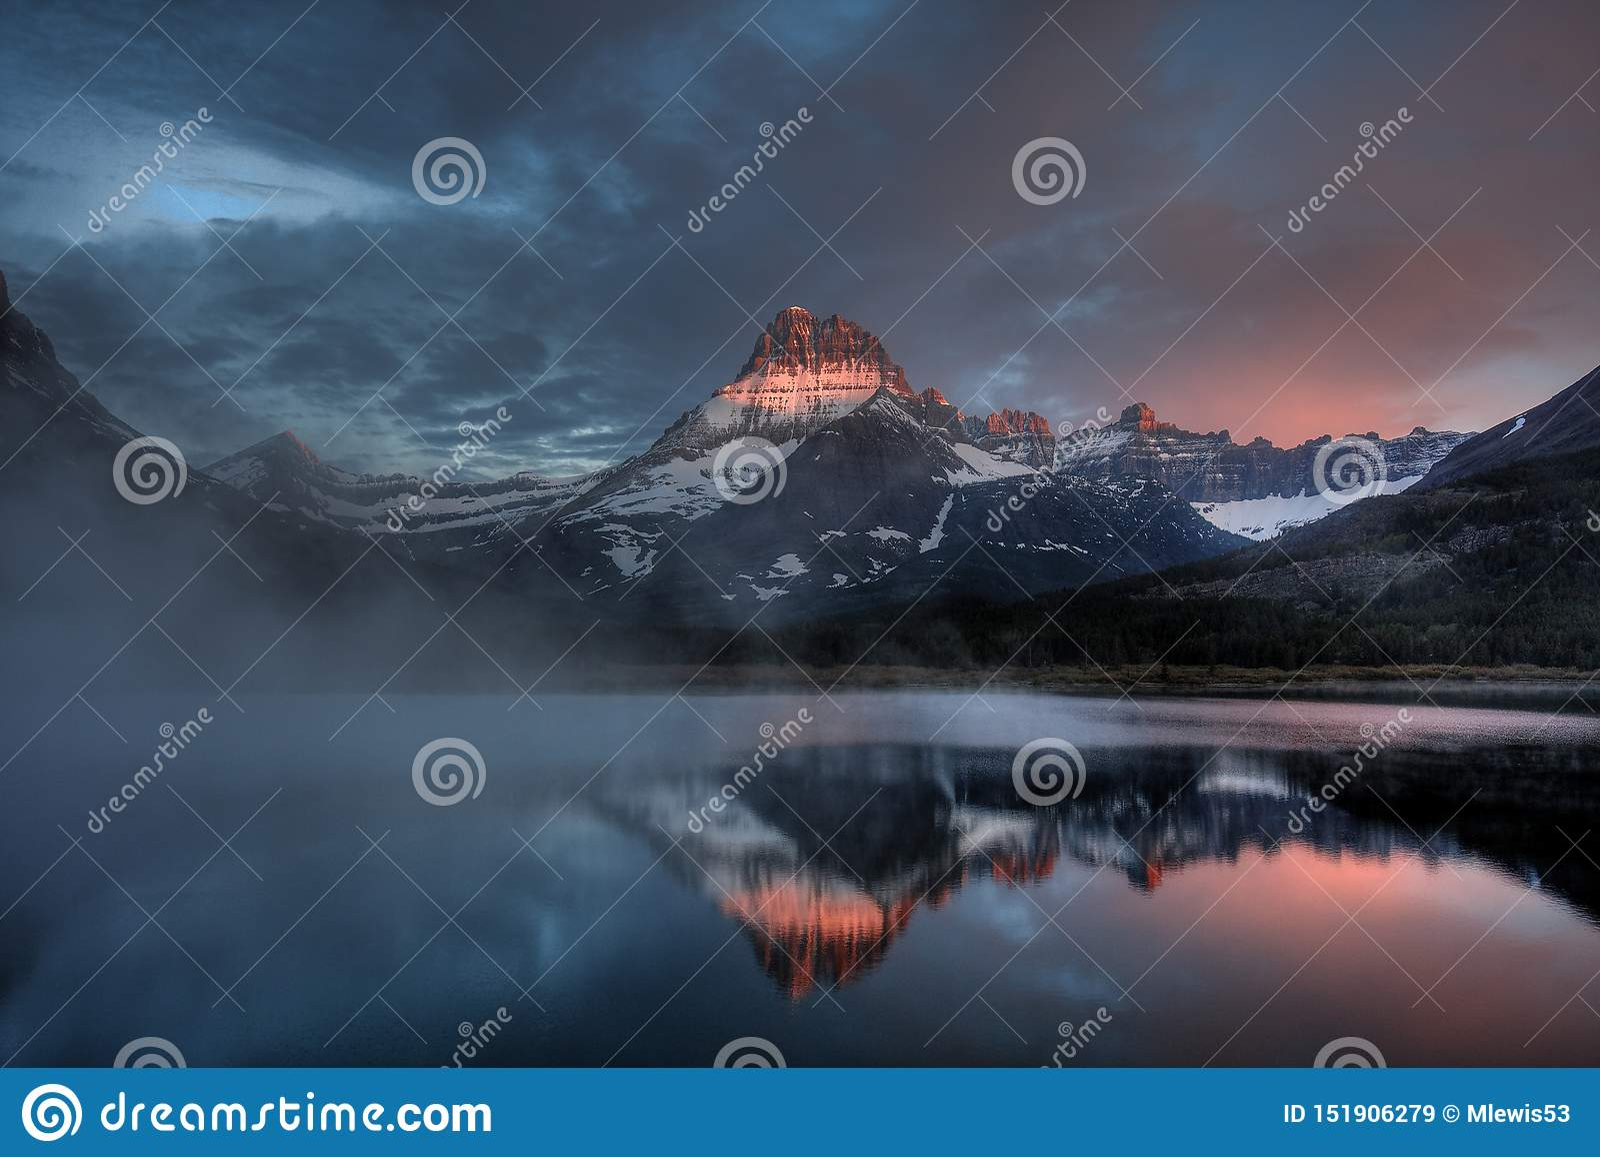 Swiftcurrent Lake Misty Dawn, Glacier National Park, Montana, USA